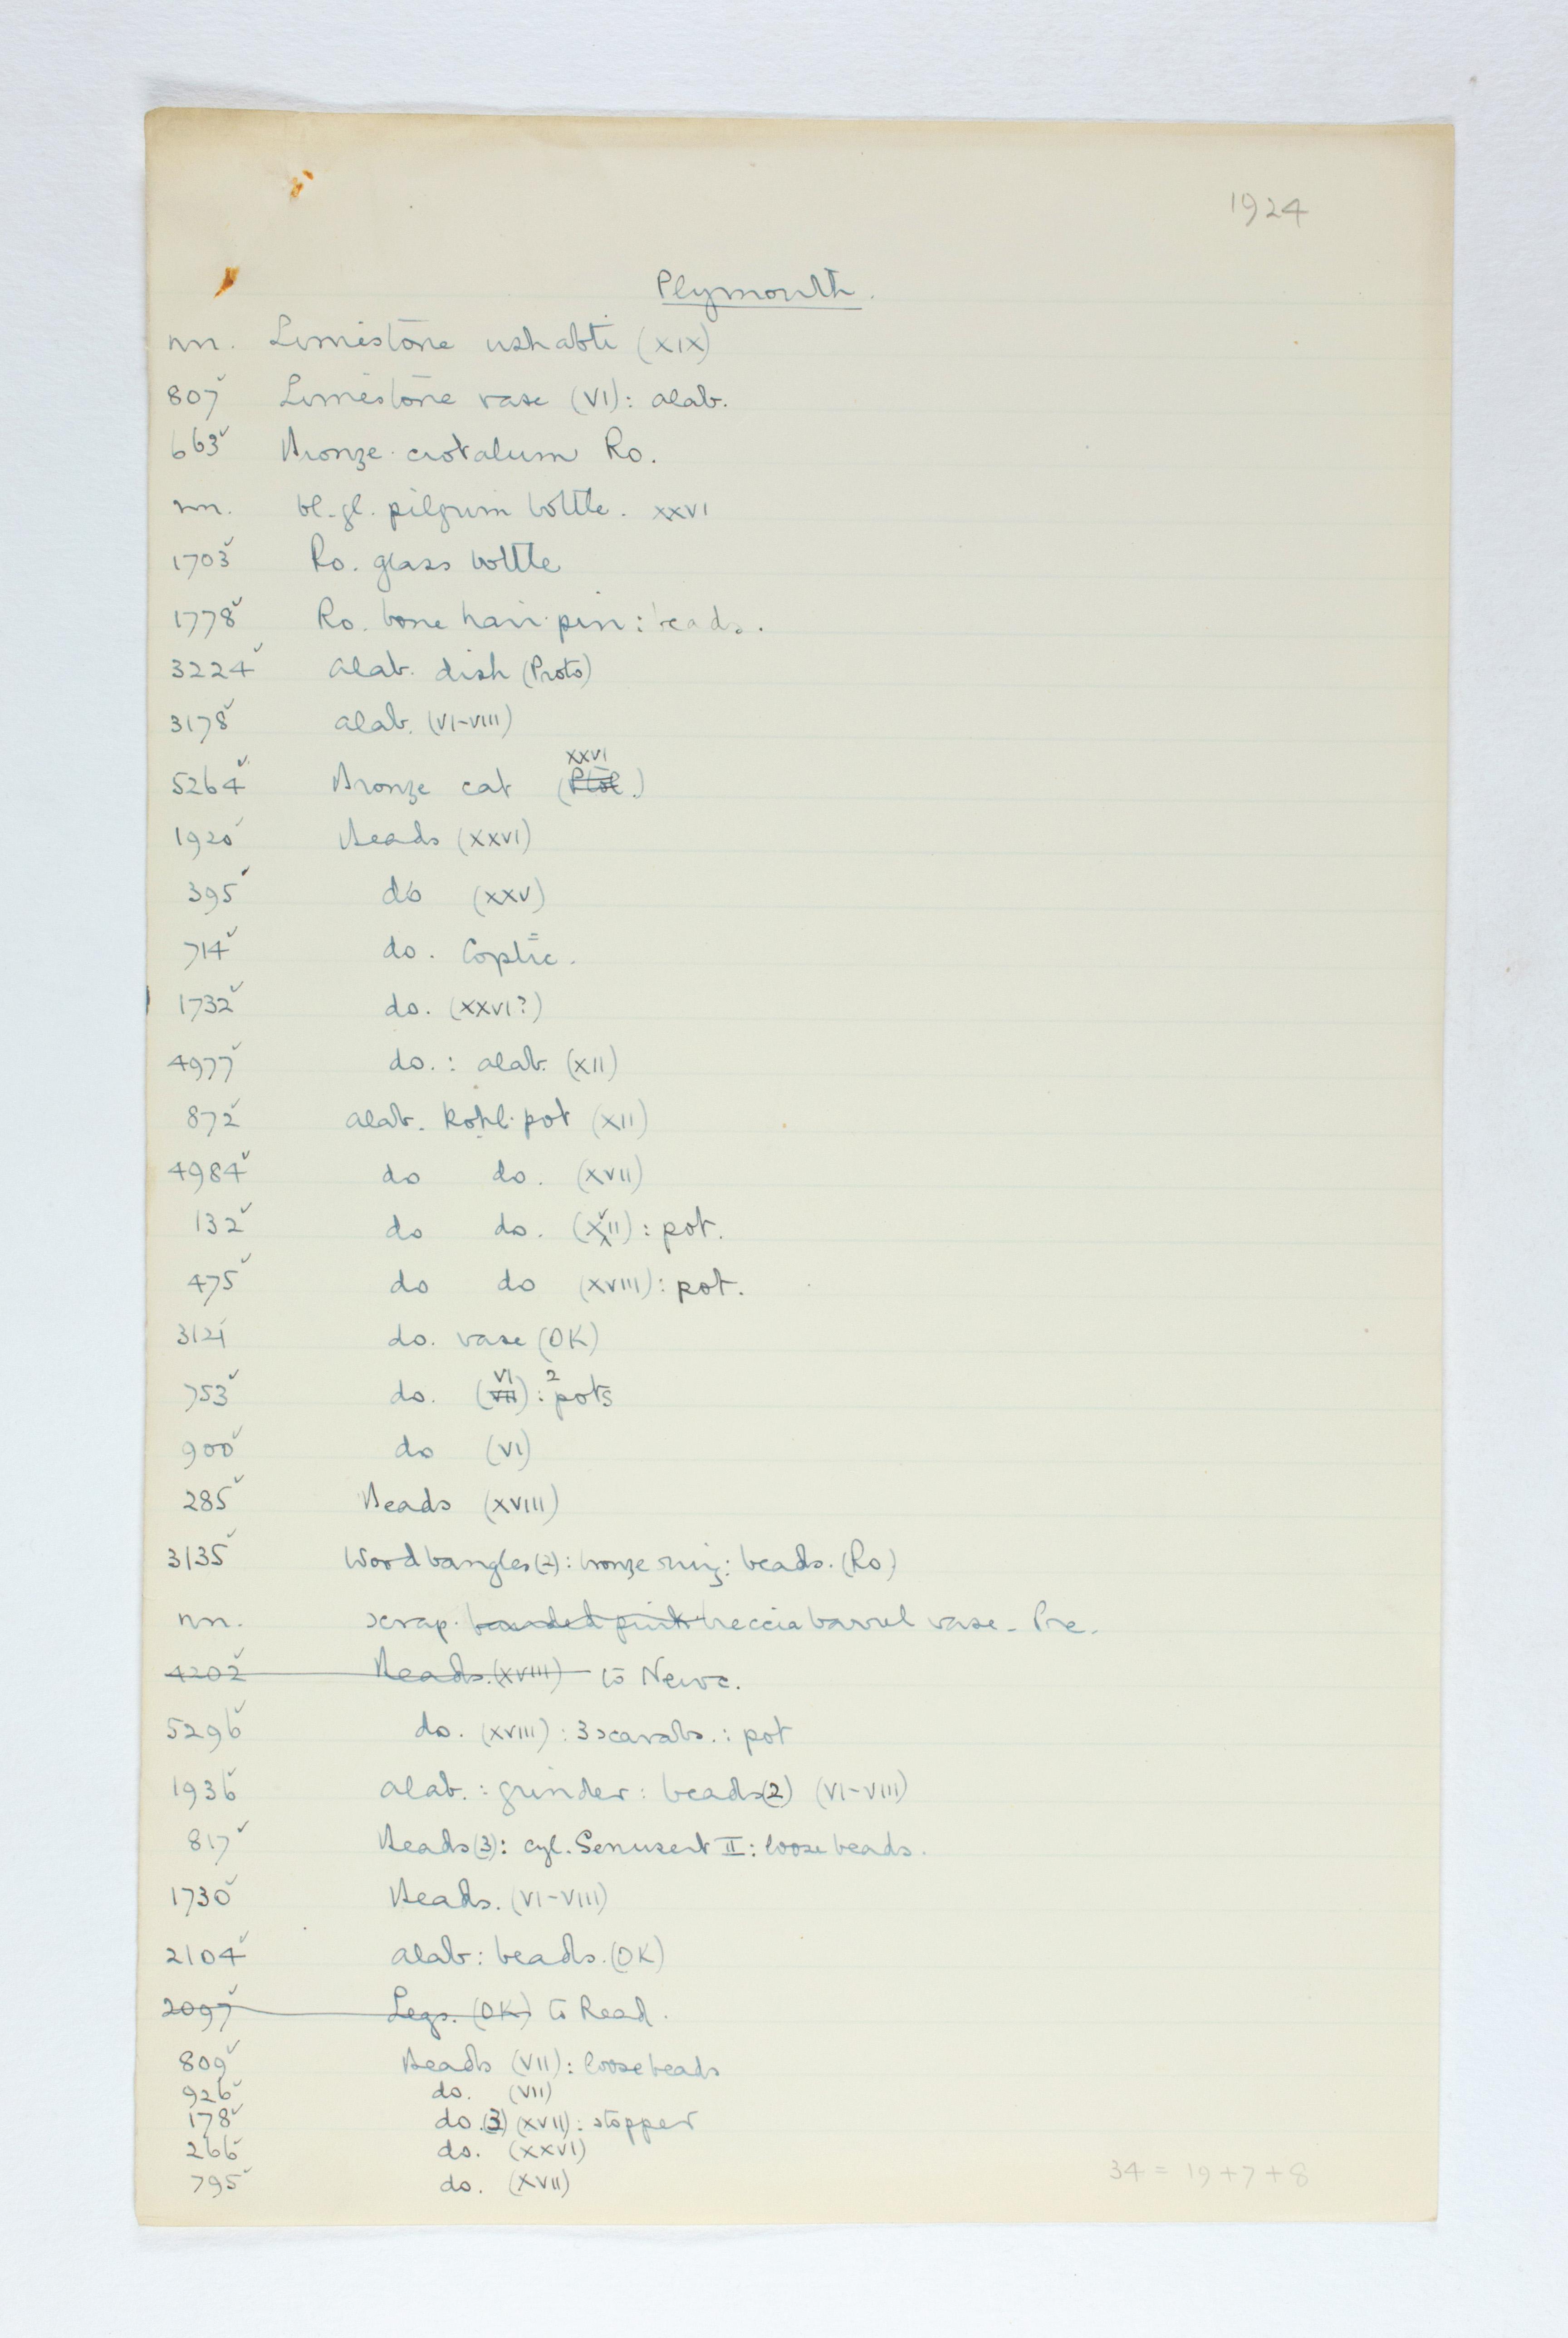 1923-24 Qau el-Kebir, Hemamieh Individual institution list PMA/WFP1/D/27/23.1